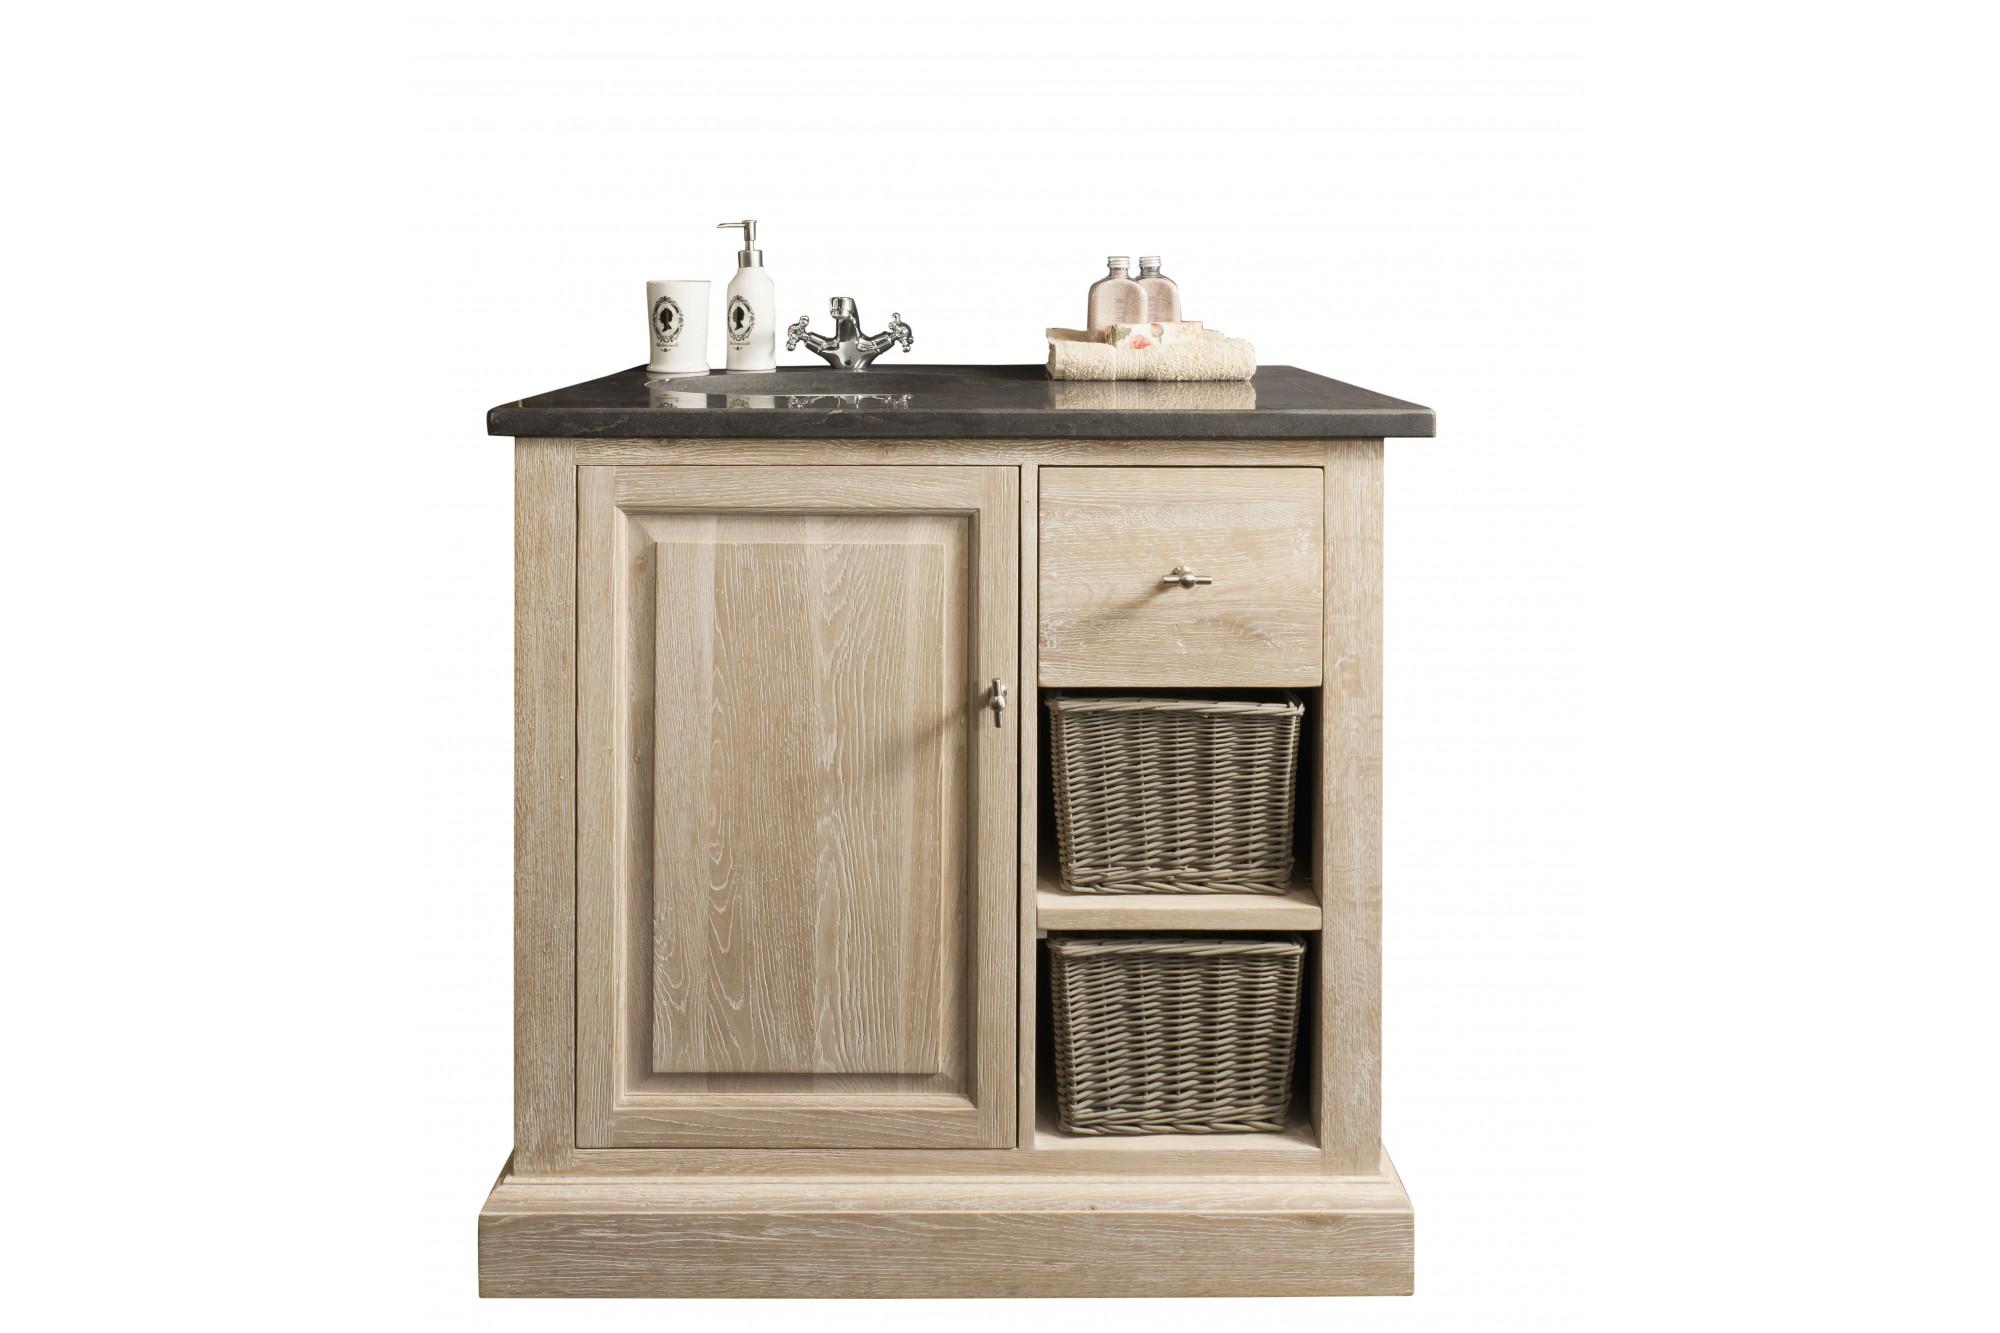 Meuble De Salle De Bain Osier meuble de salle de bain en chêne massif avec plan en pierre - hellin